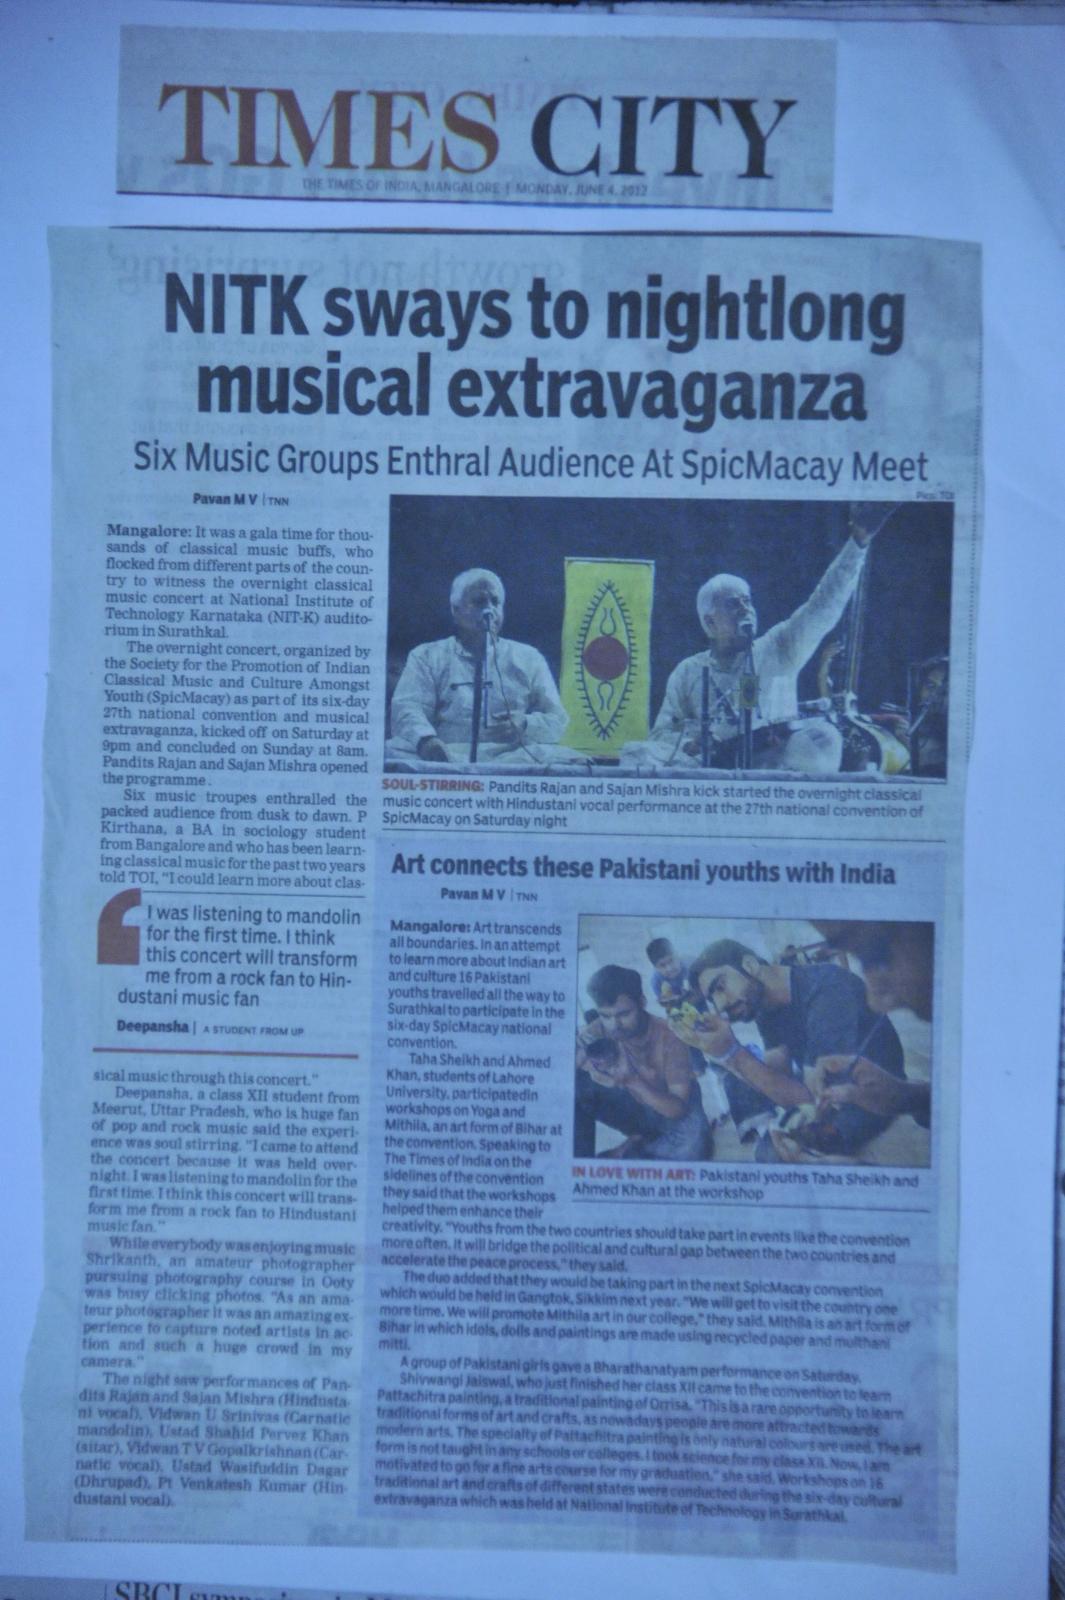 NITK sways to nightlong musical extravaganza?!